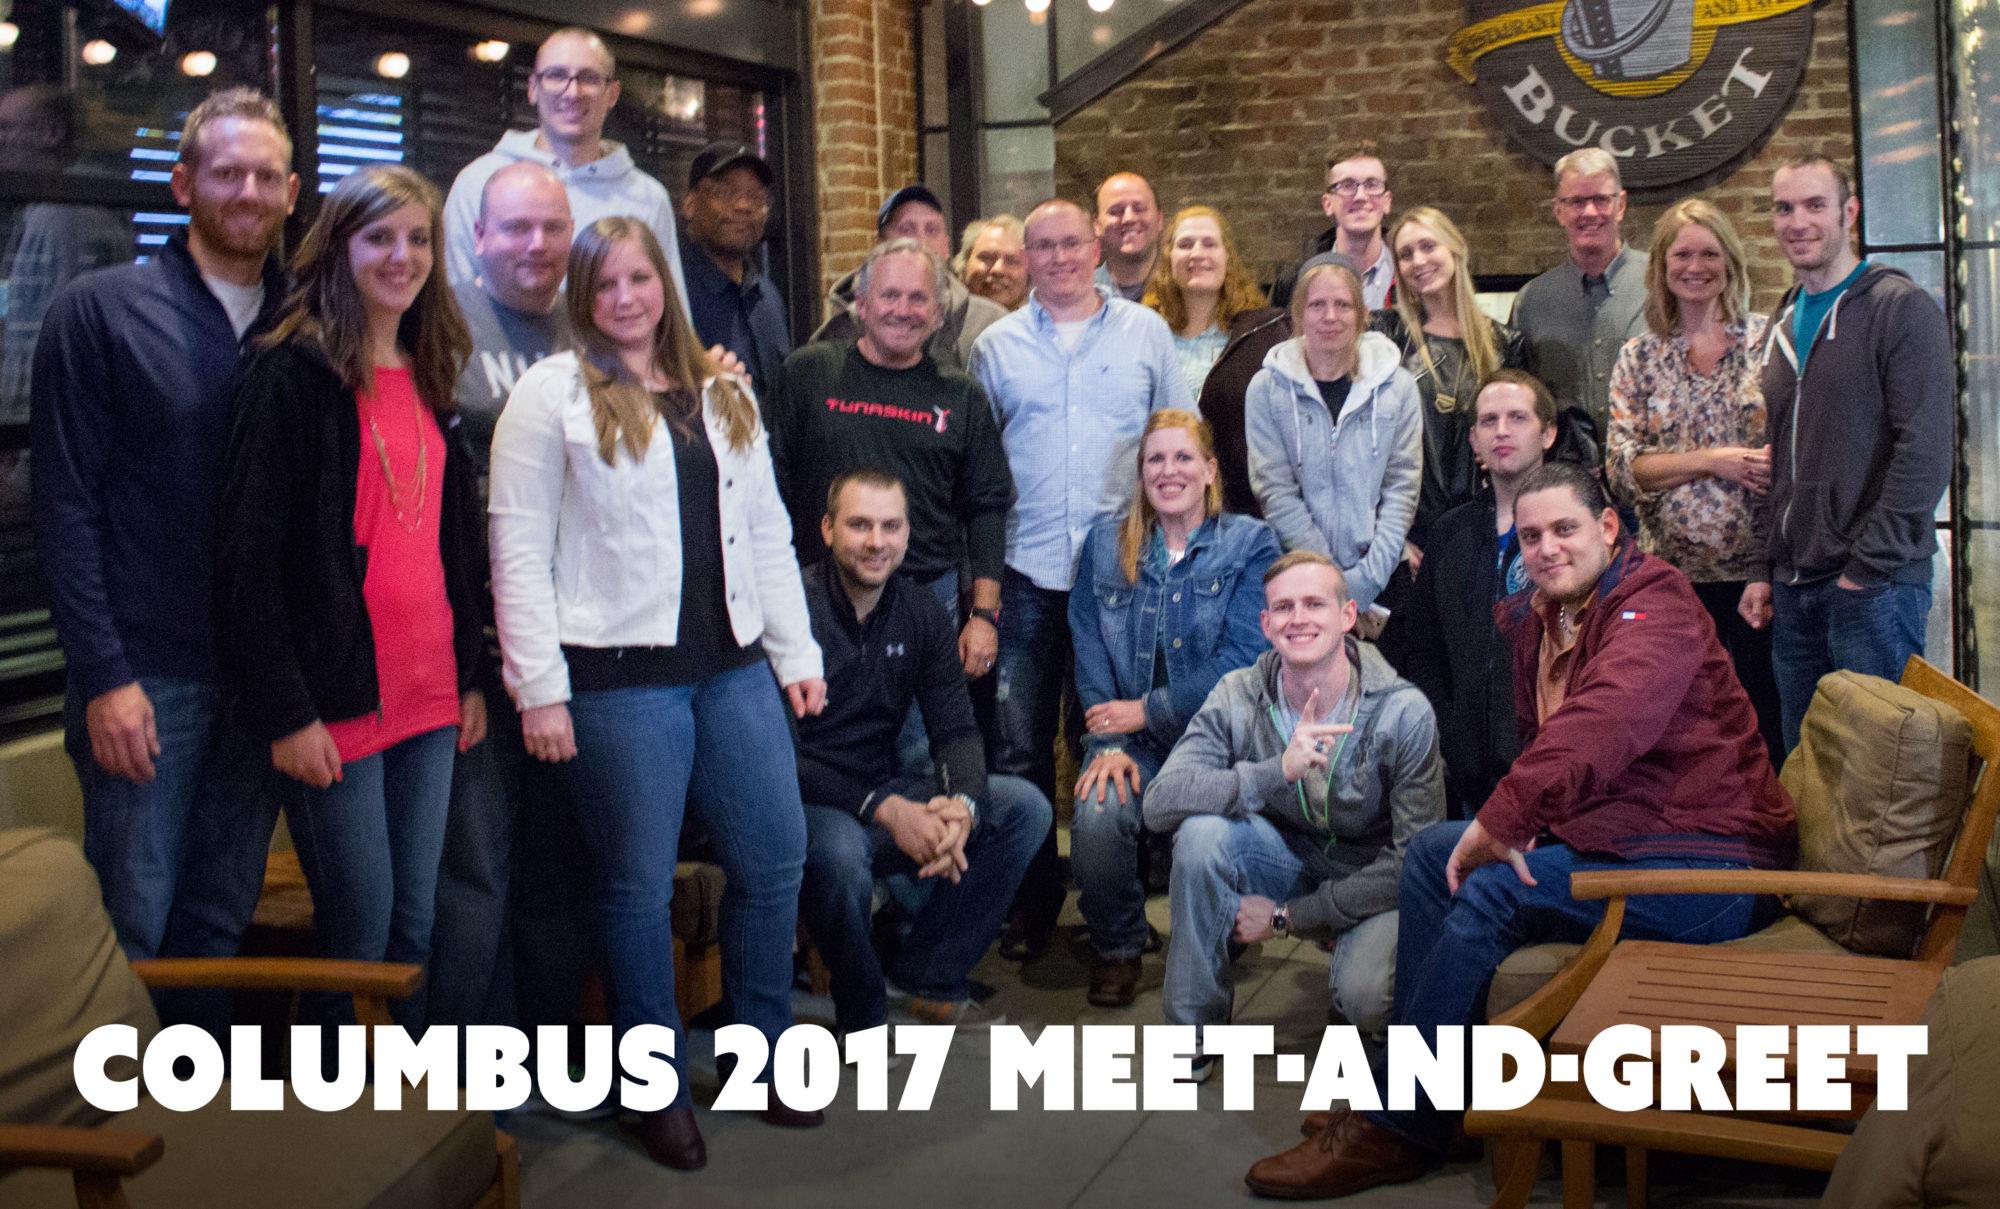 Columbus 2017 Meet-and-Greet